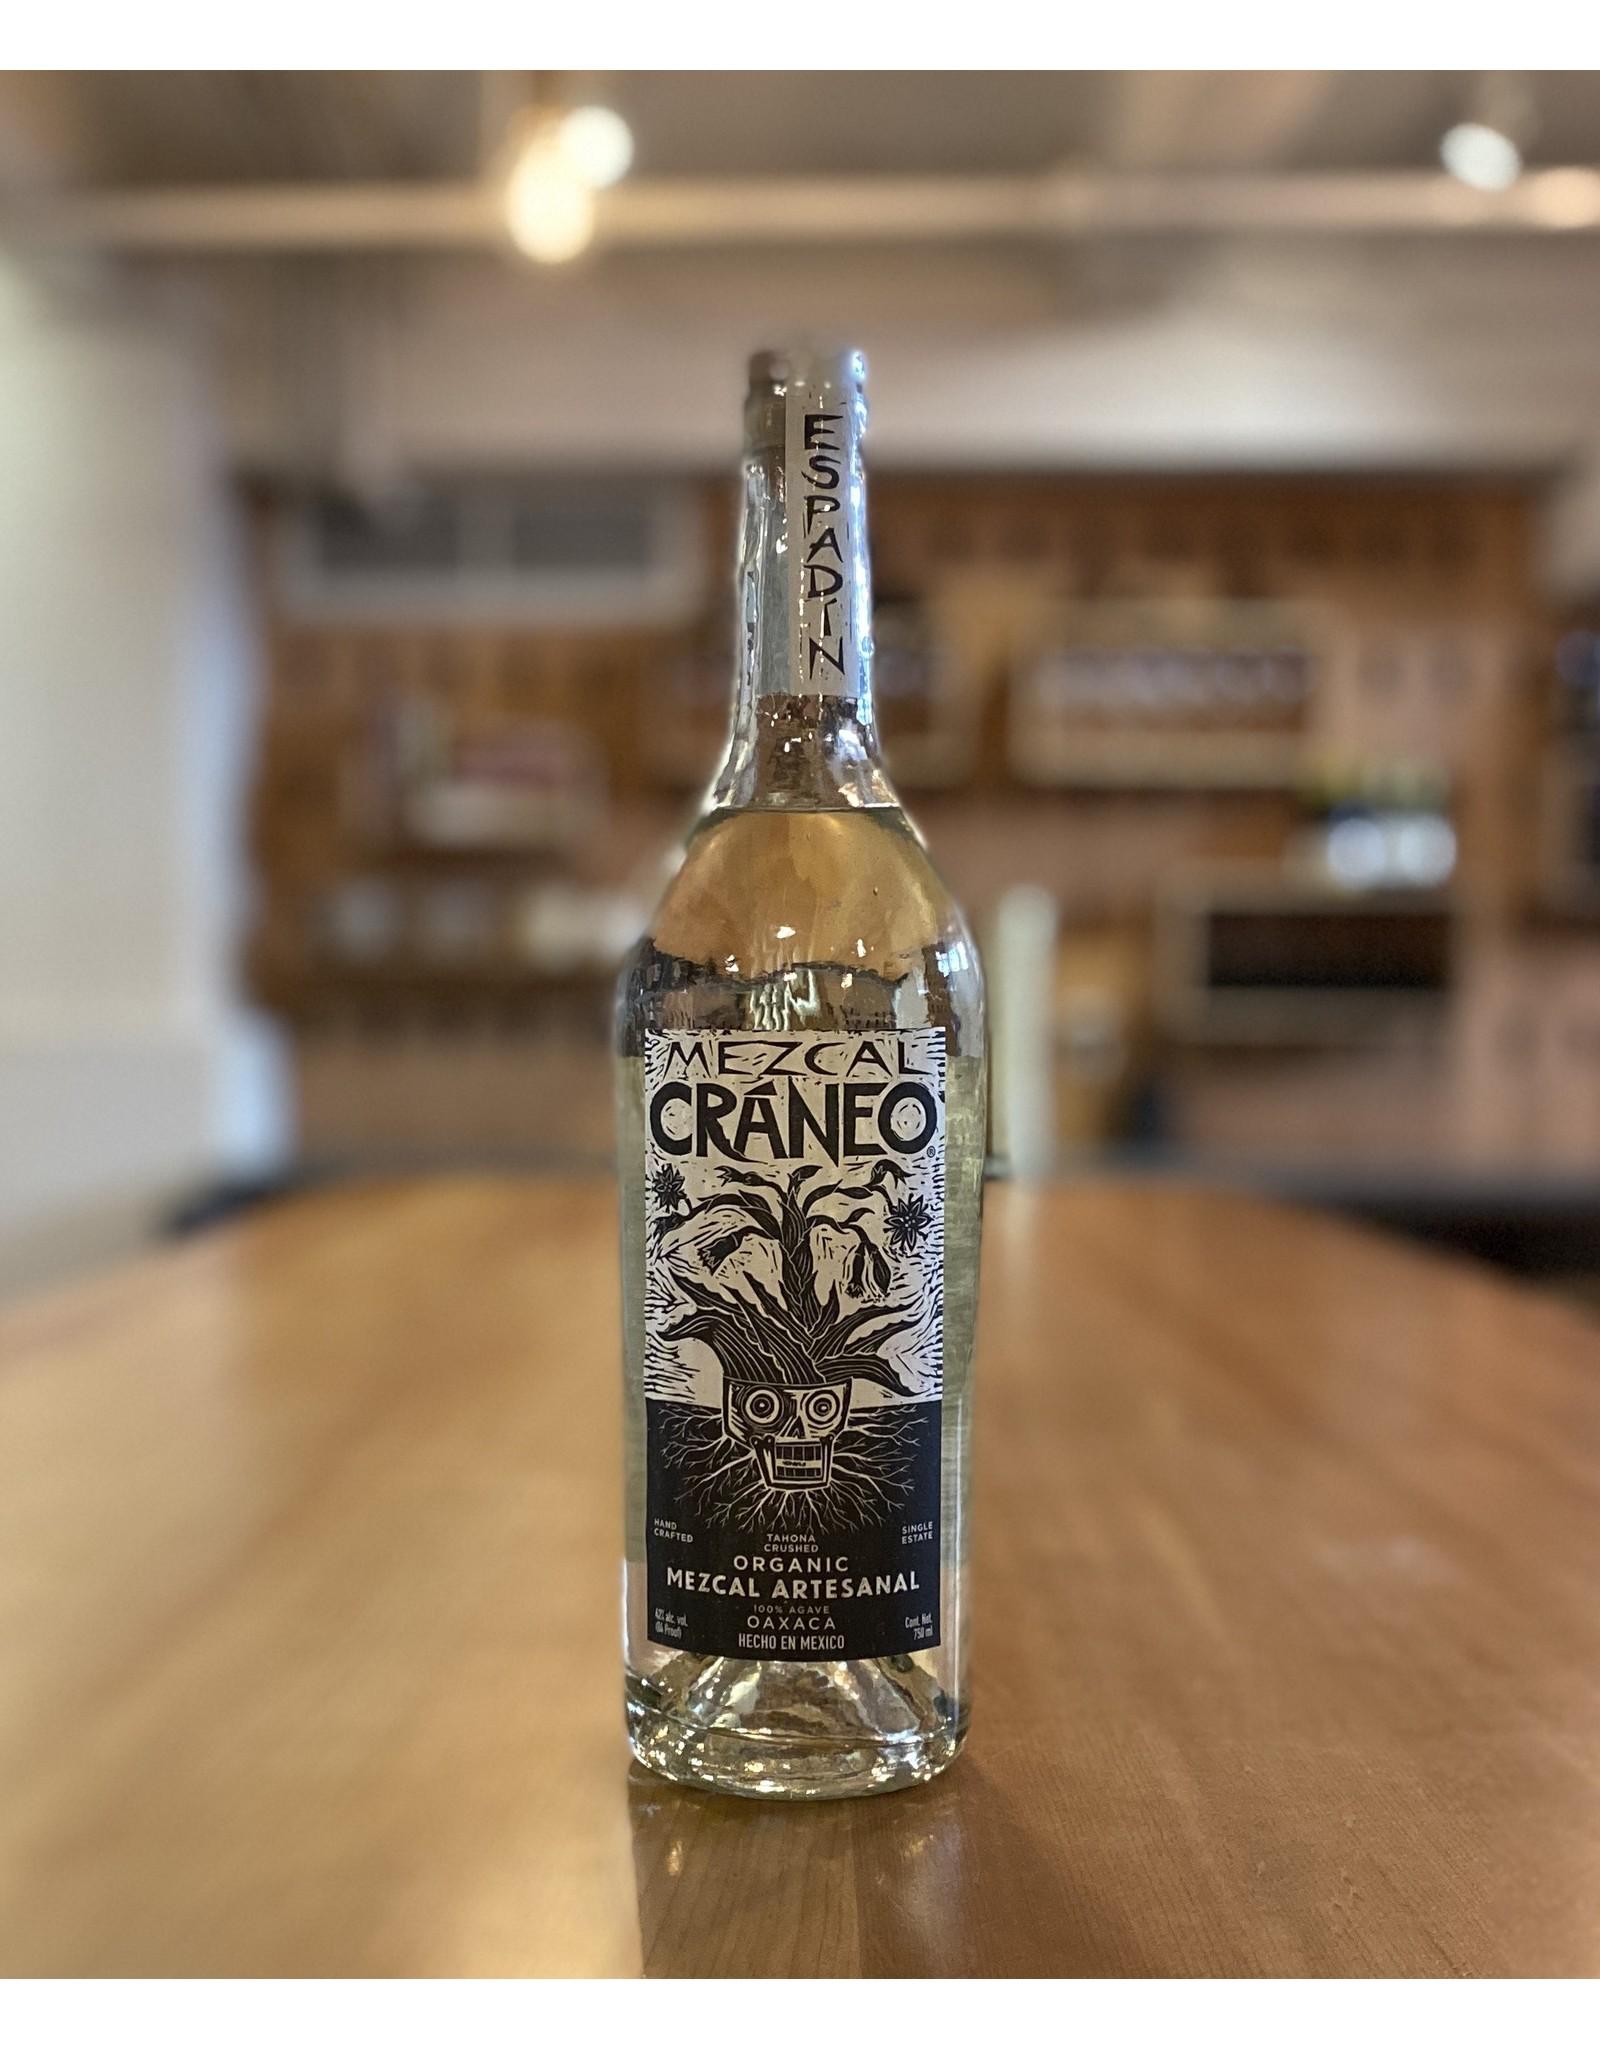 123 Organic ''Craneo'' Organic Mezcal - Oaxaca, Mexico